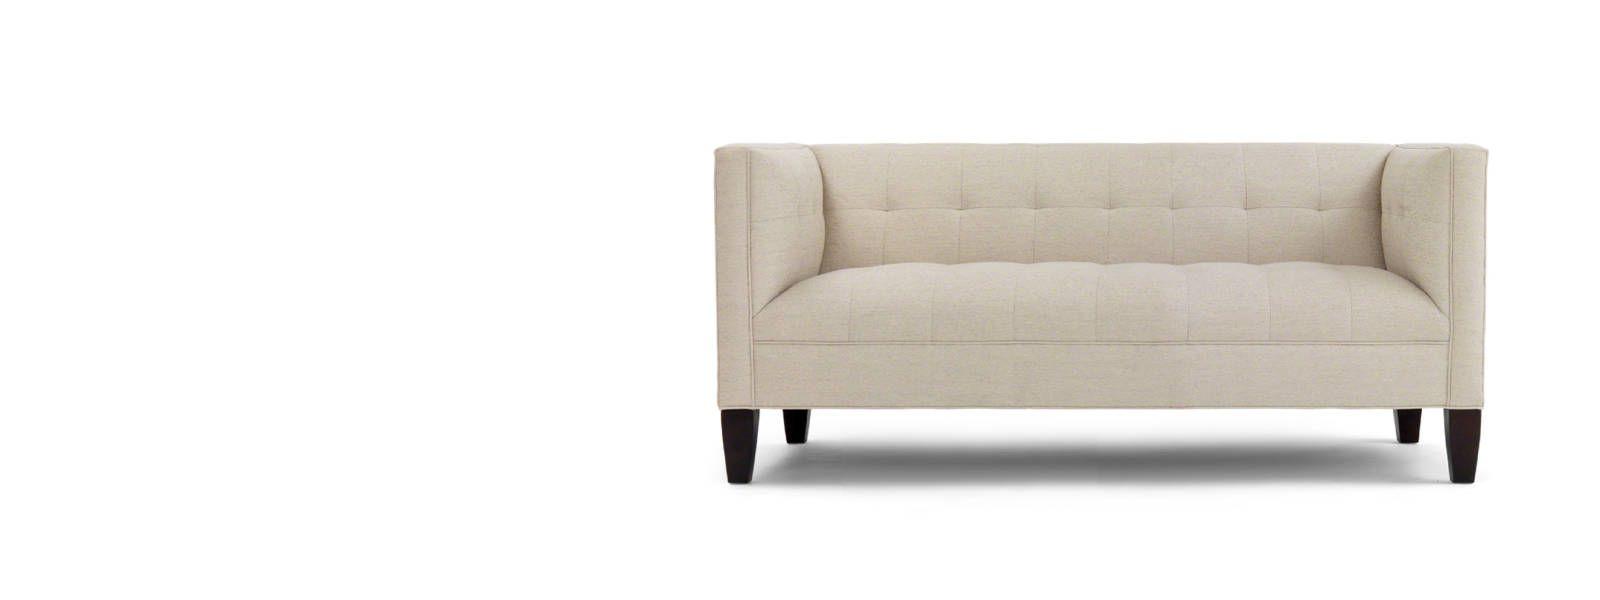 Kennedy Sofa Sofa Love Seat Steelcase